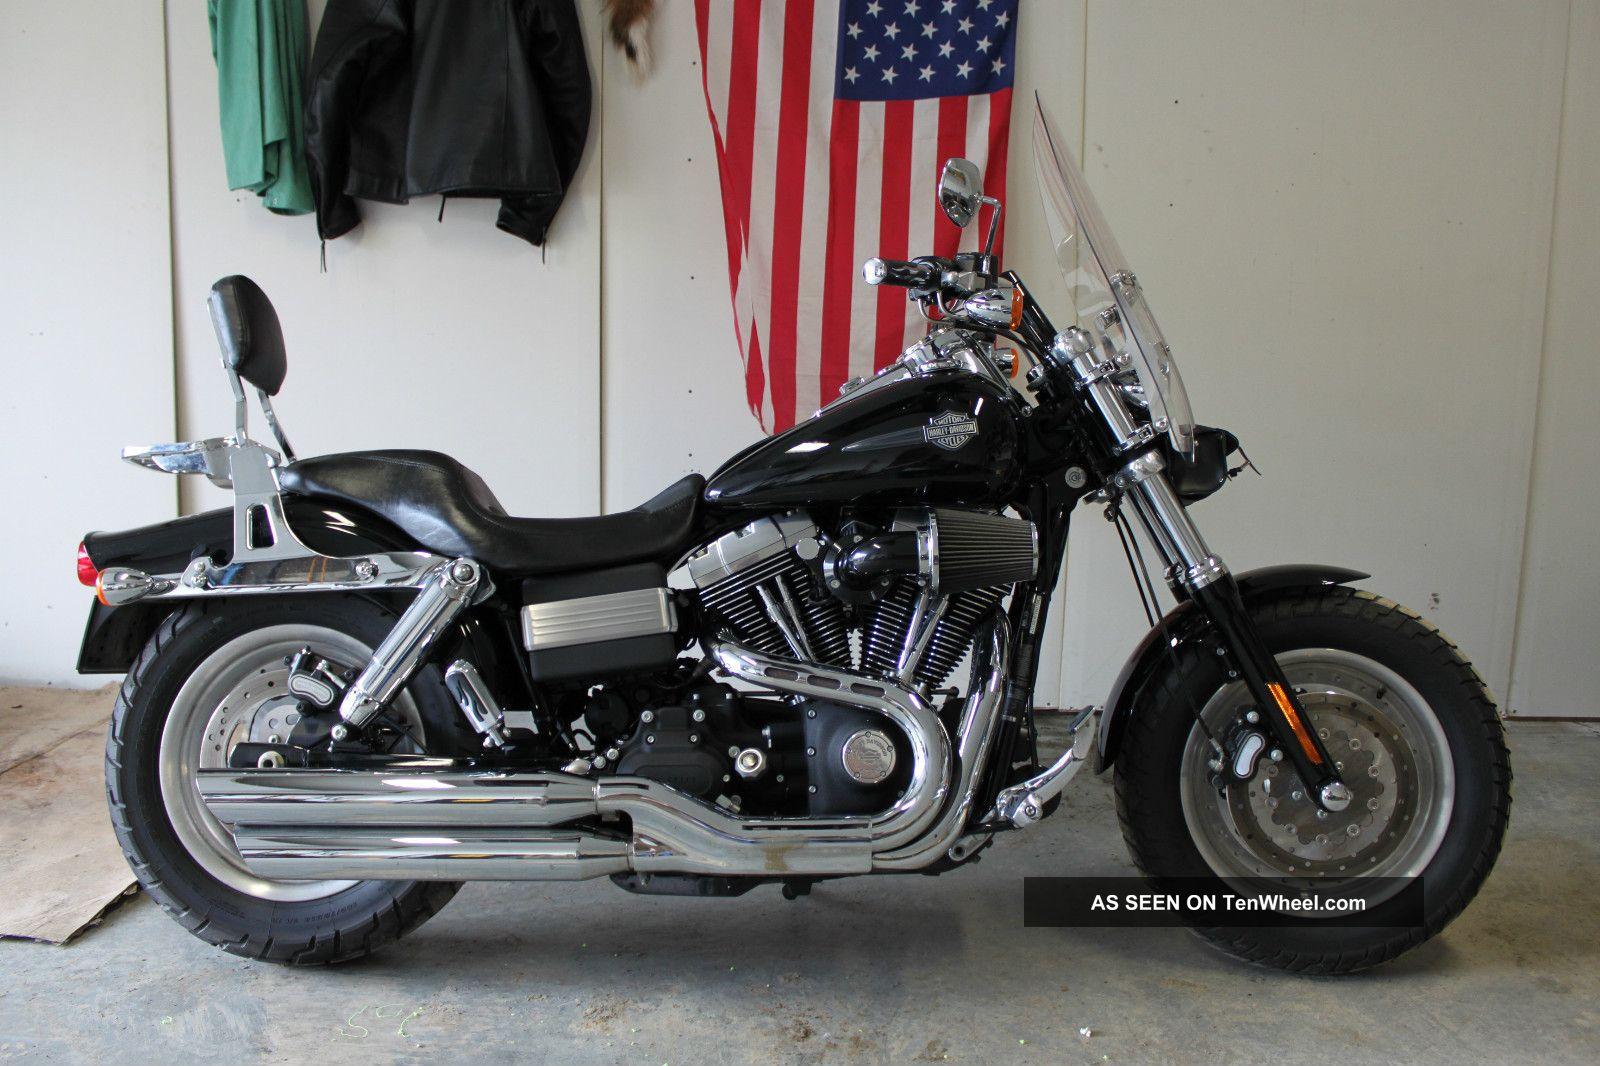 2009 Harley Davidson Fat Bob Fxdf